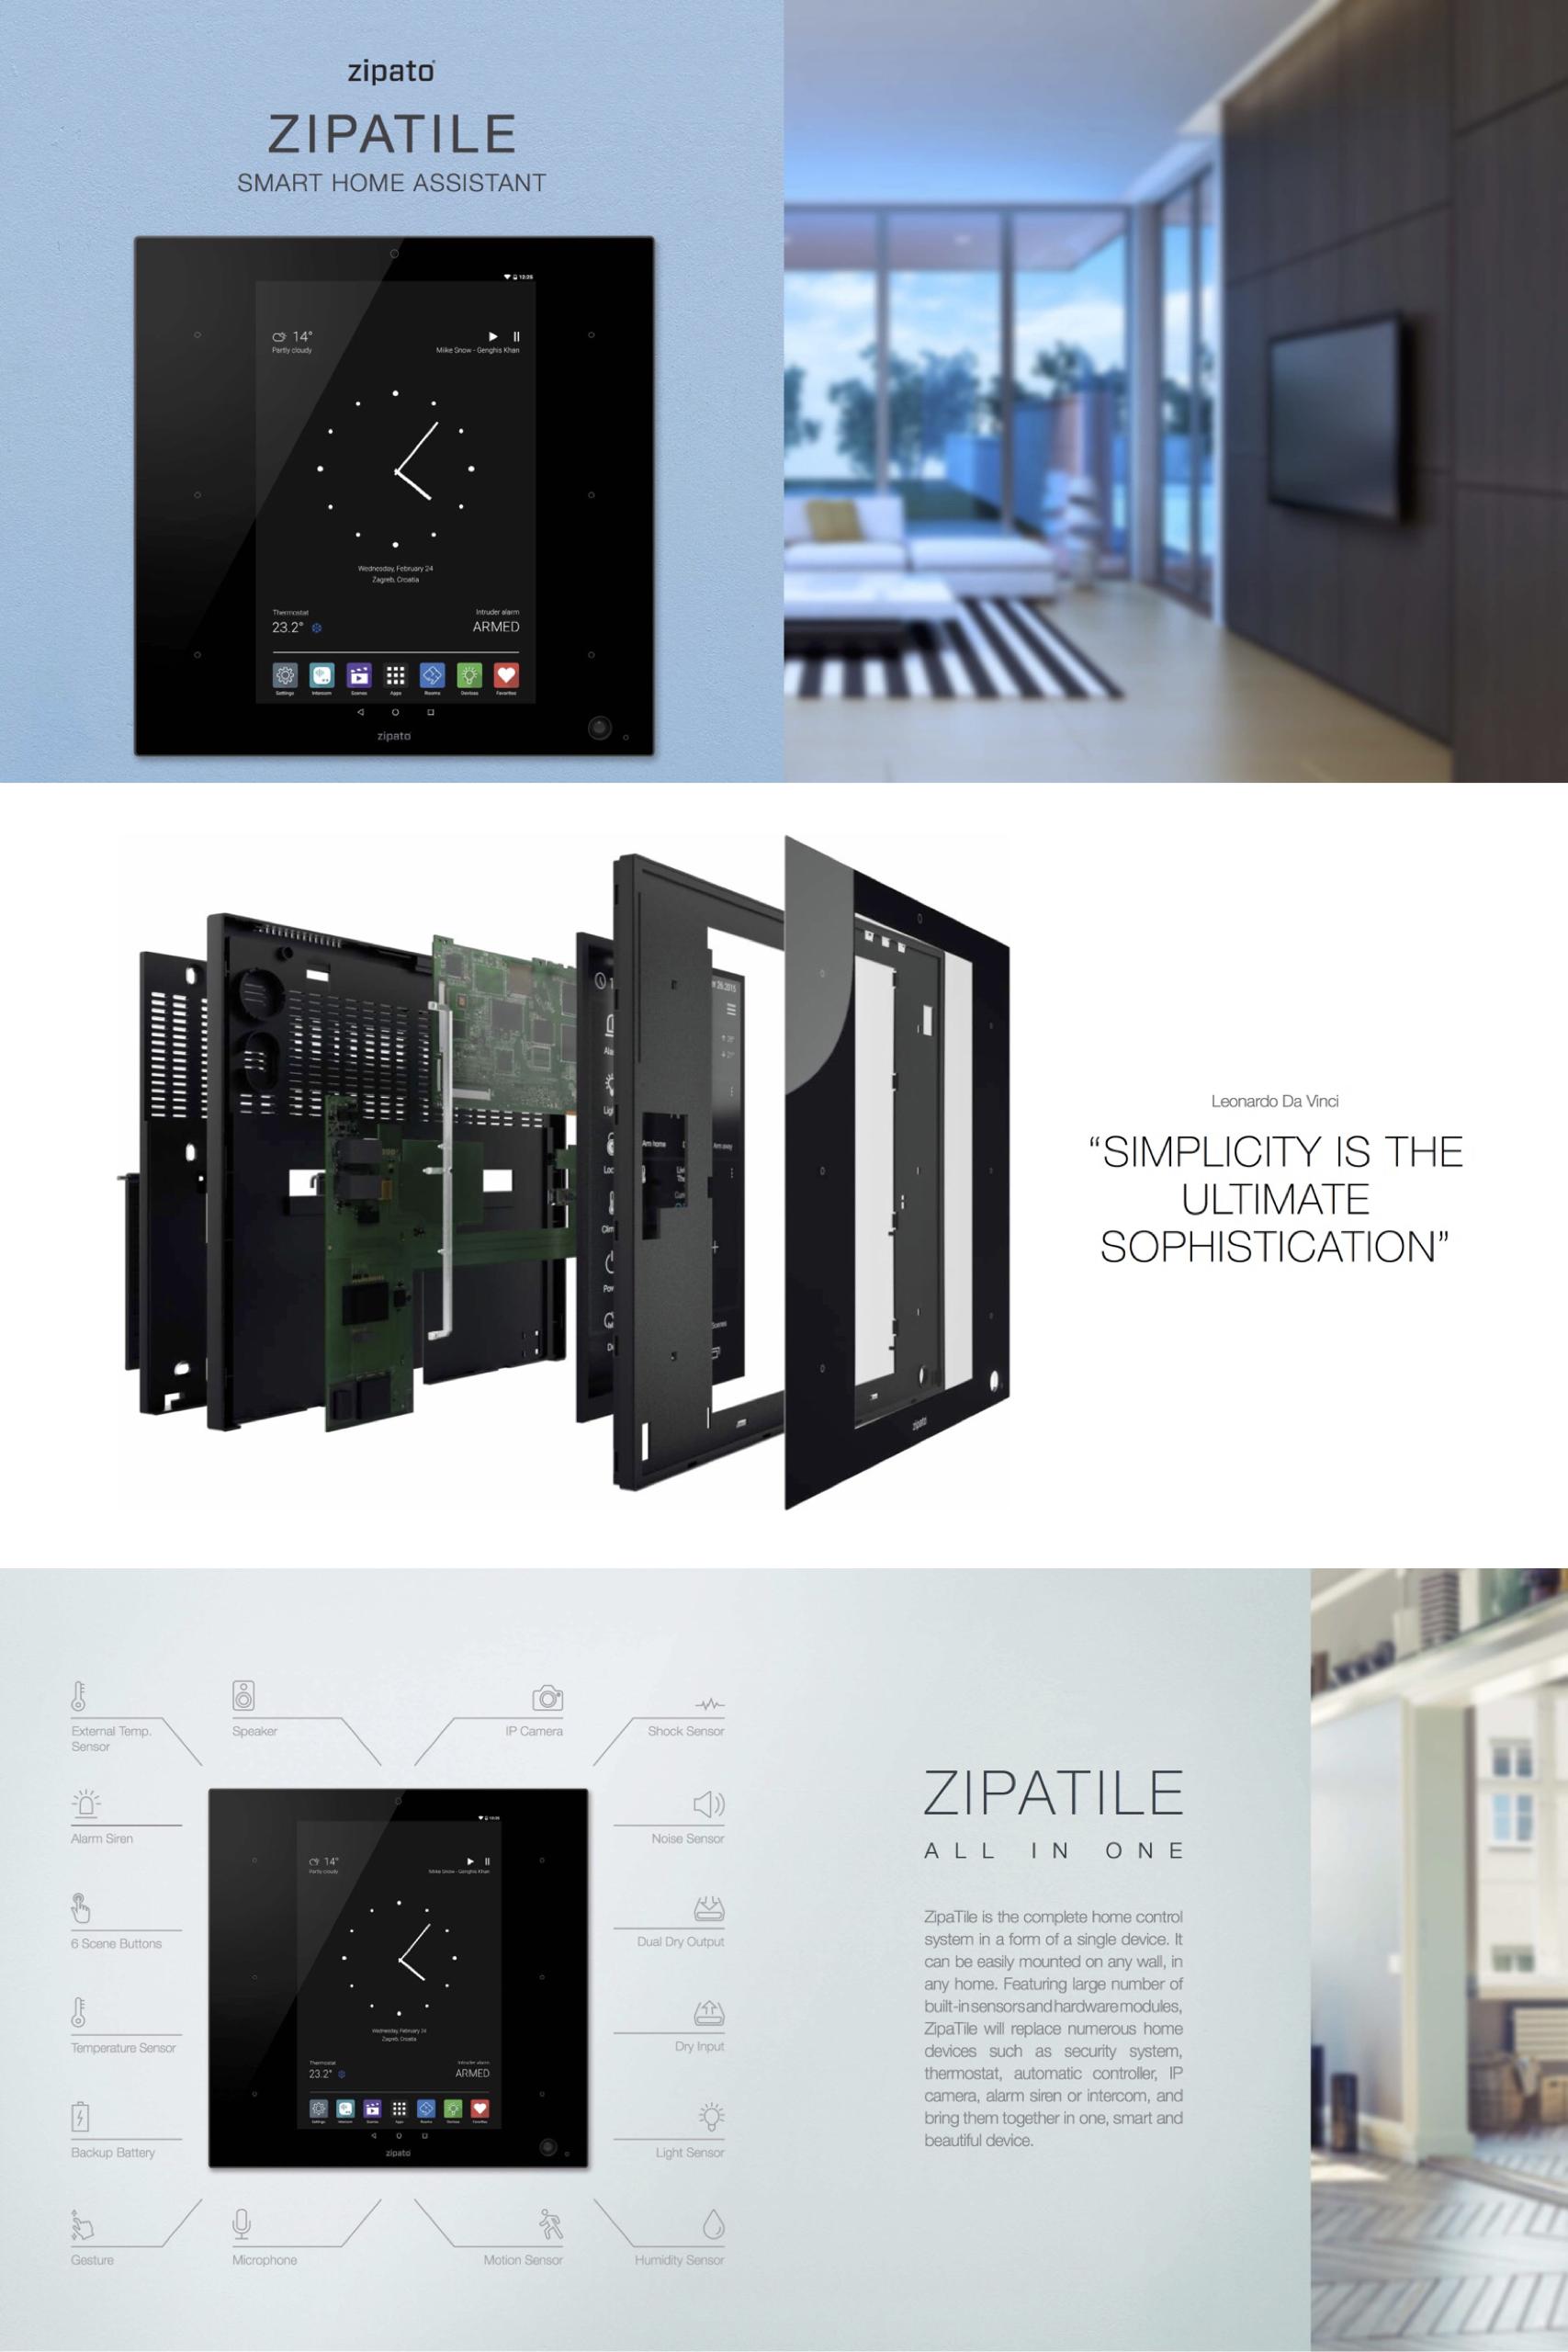 Dein Smartes Heim Mit Zipato Zipatile Intelligentes Haus Smart Home Zentrale Haus